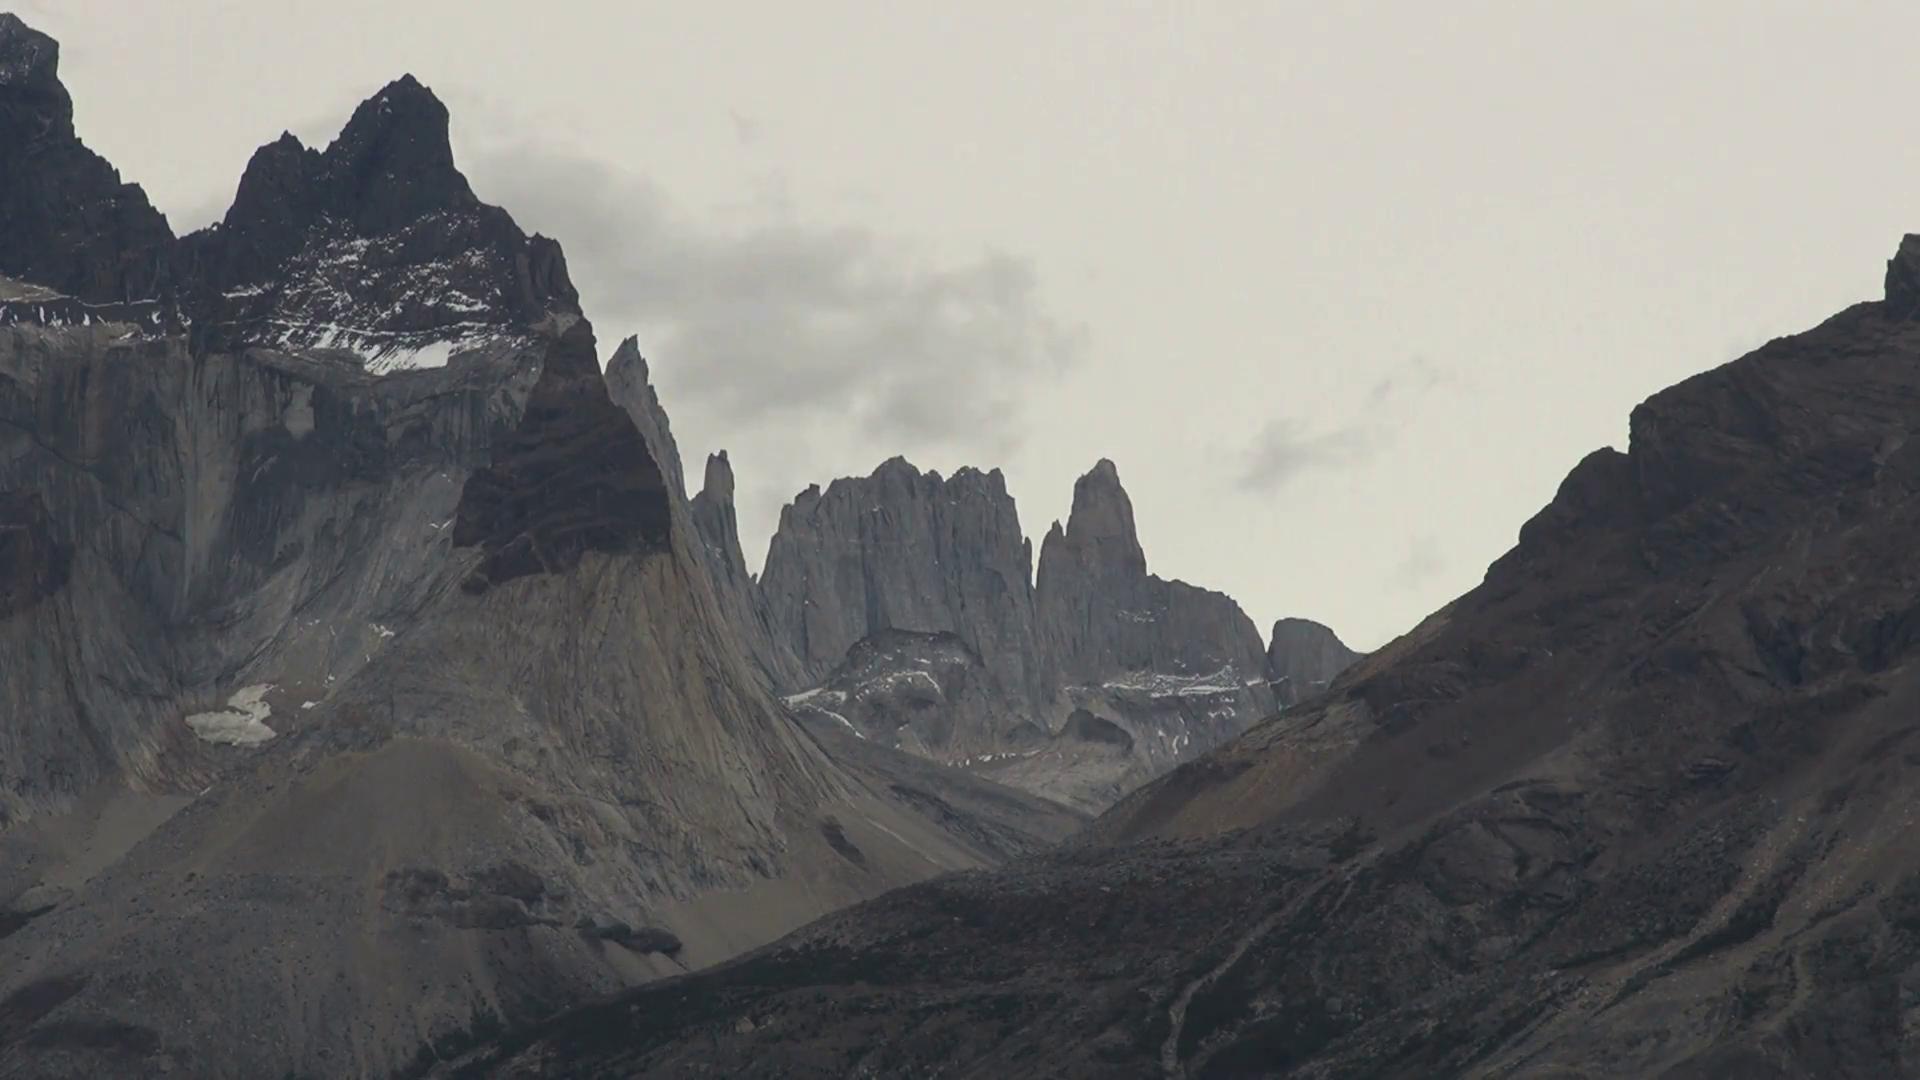 Grey Cloudy Mountain Range Stock Video Footage - Videoblocks